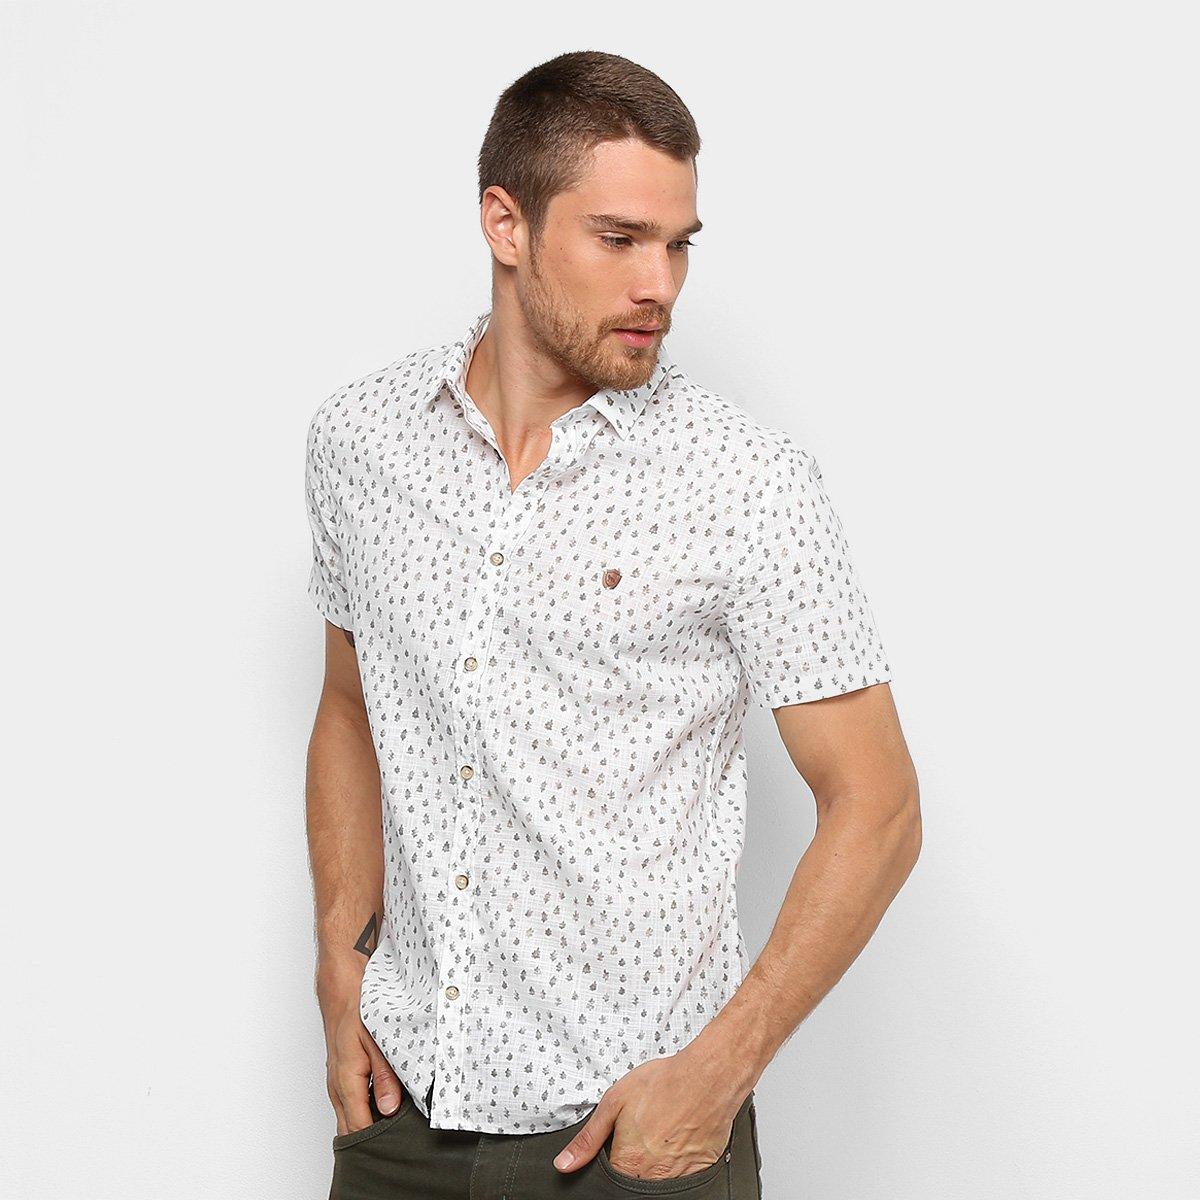 Camisa Acostamento Estampada Manga Curta Masculina. undefined 035957f44f0bb